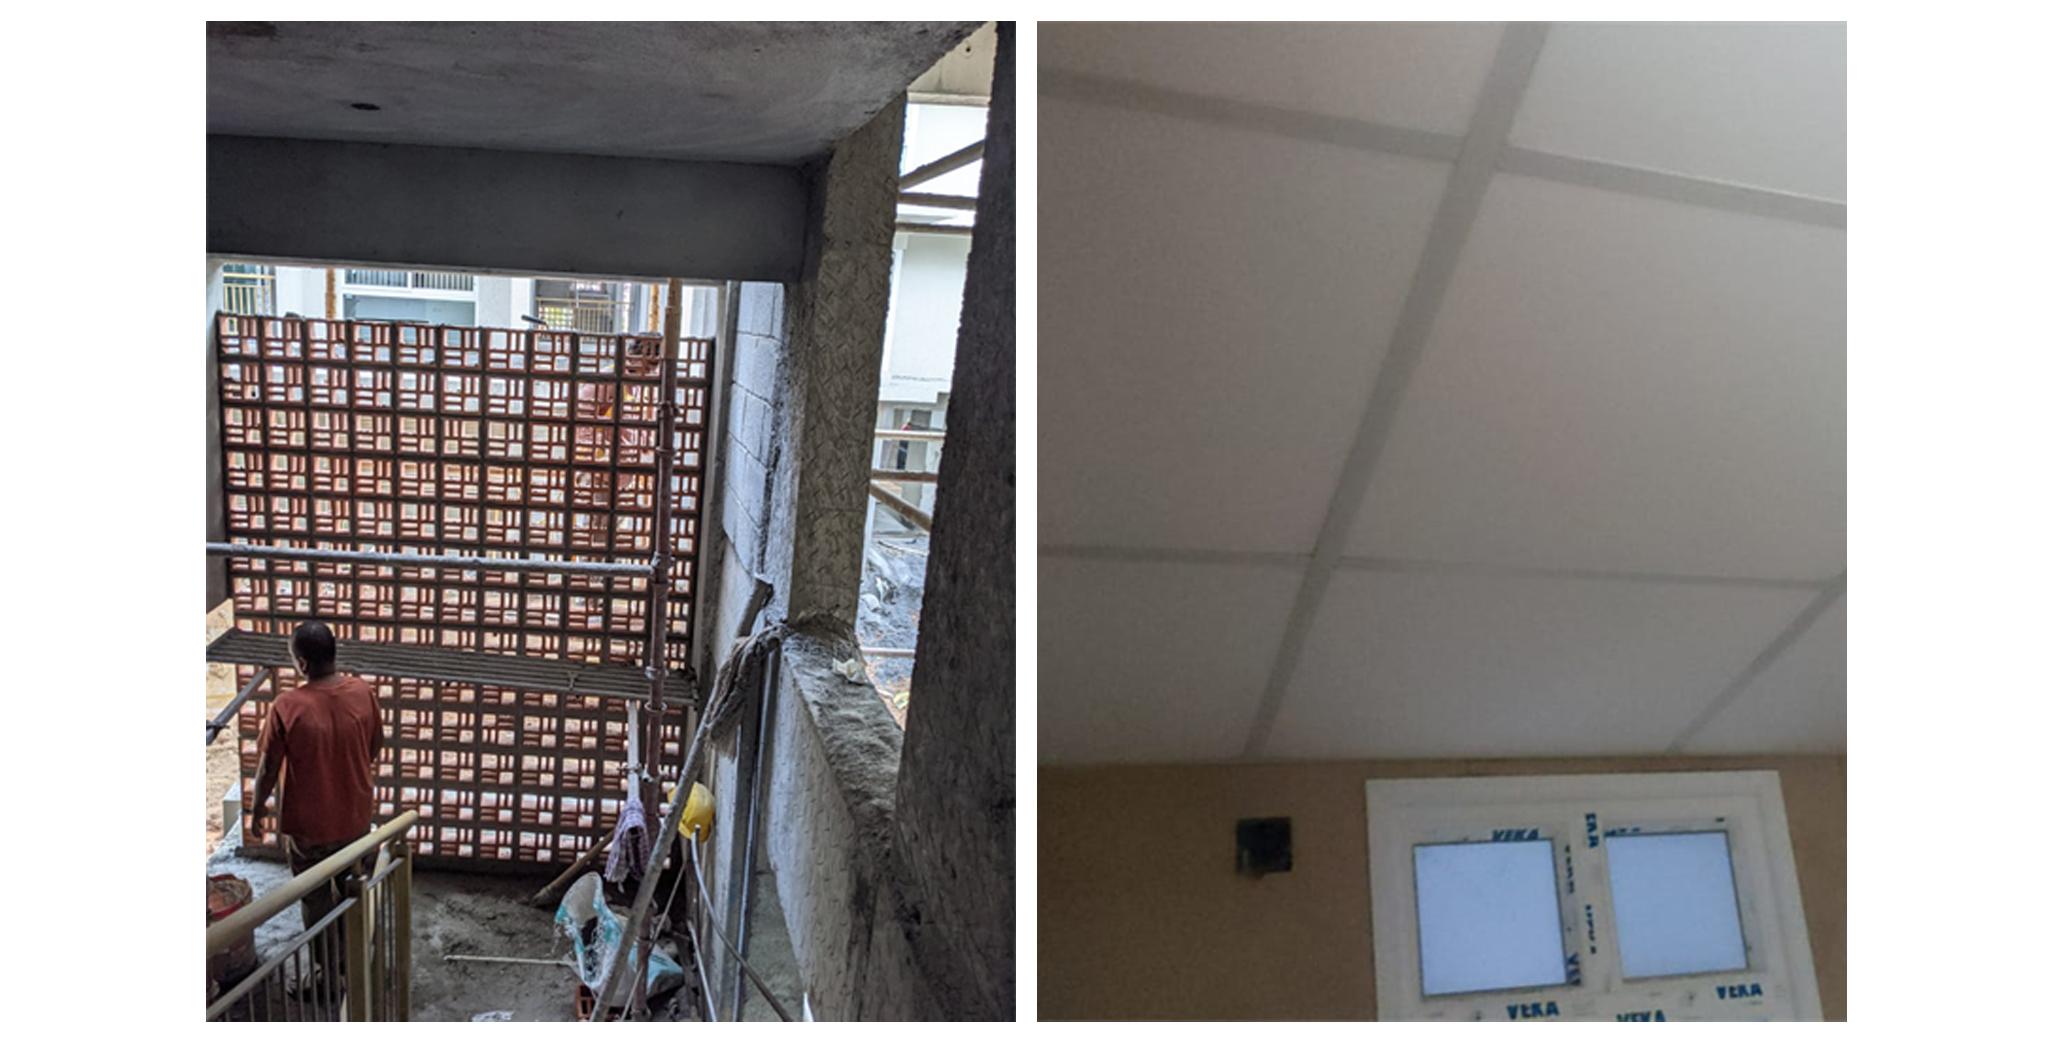 Aug 2021 - R Block: Staircase Jally work in progress. Toilet false ceiling work in progress.